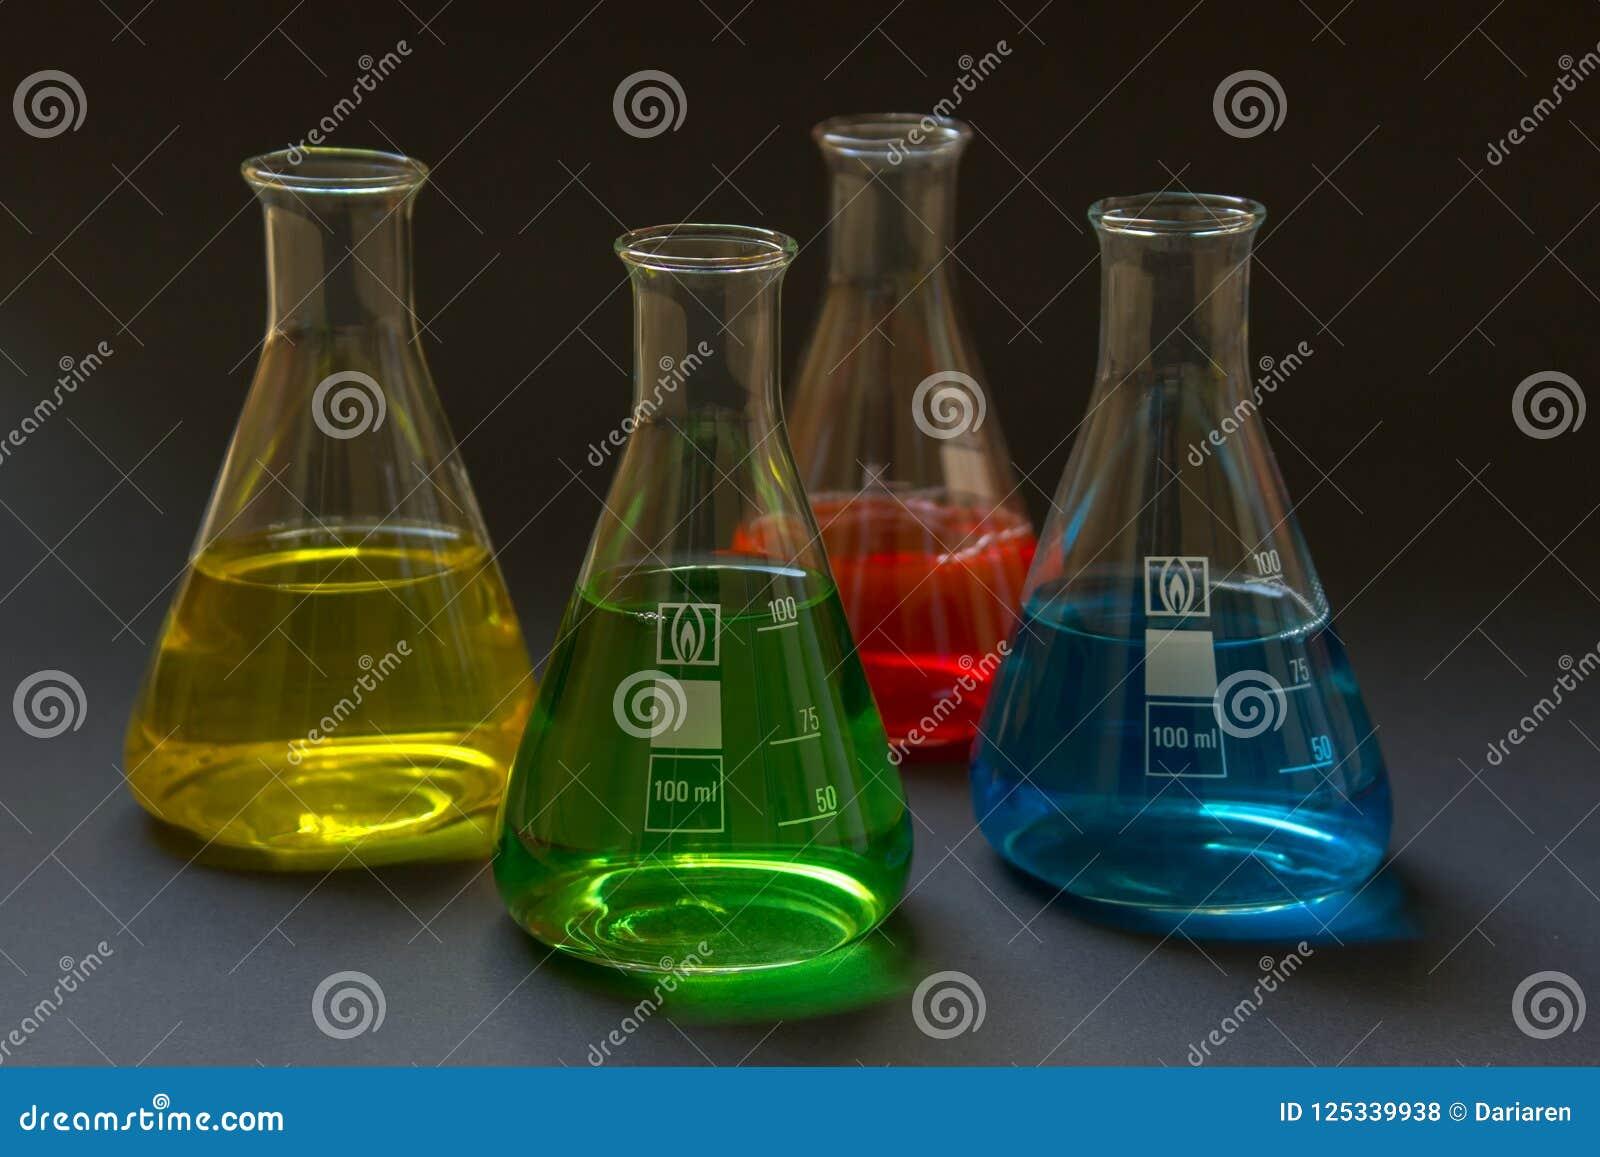 Four laboratory flasks with liquids.